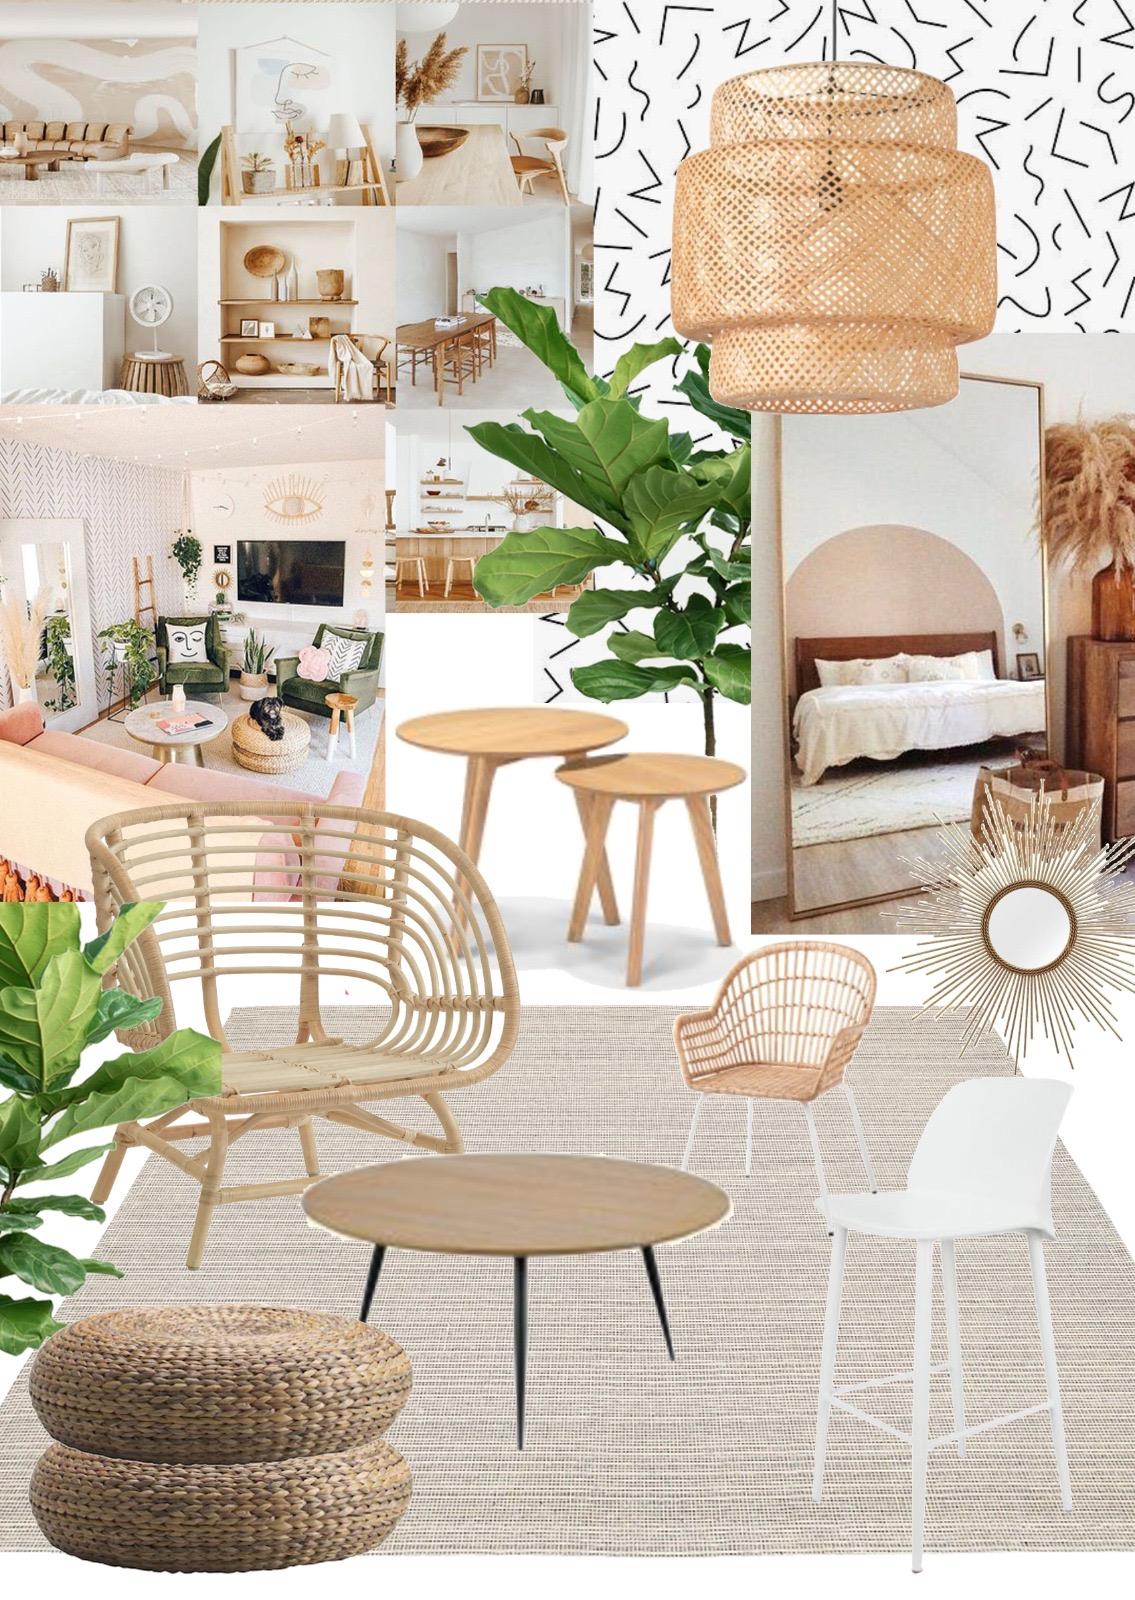 Interior Design: Complete Guide For Hiring An Interior Designer